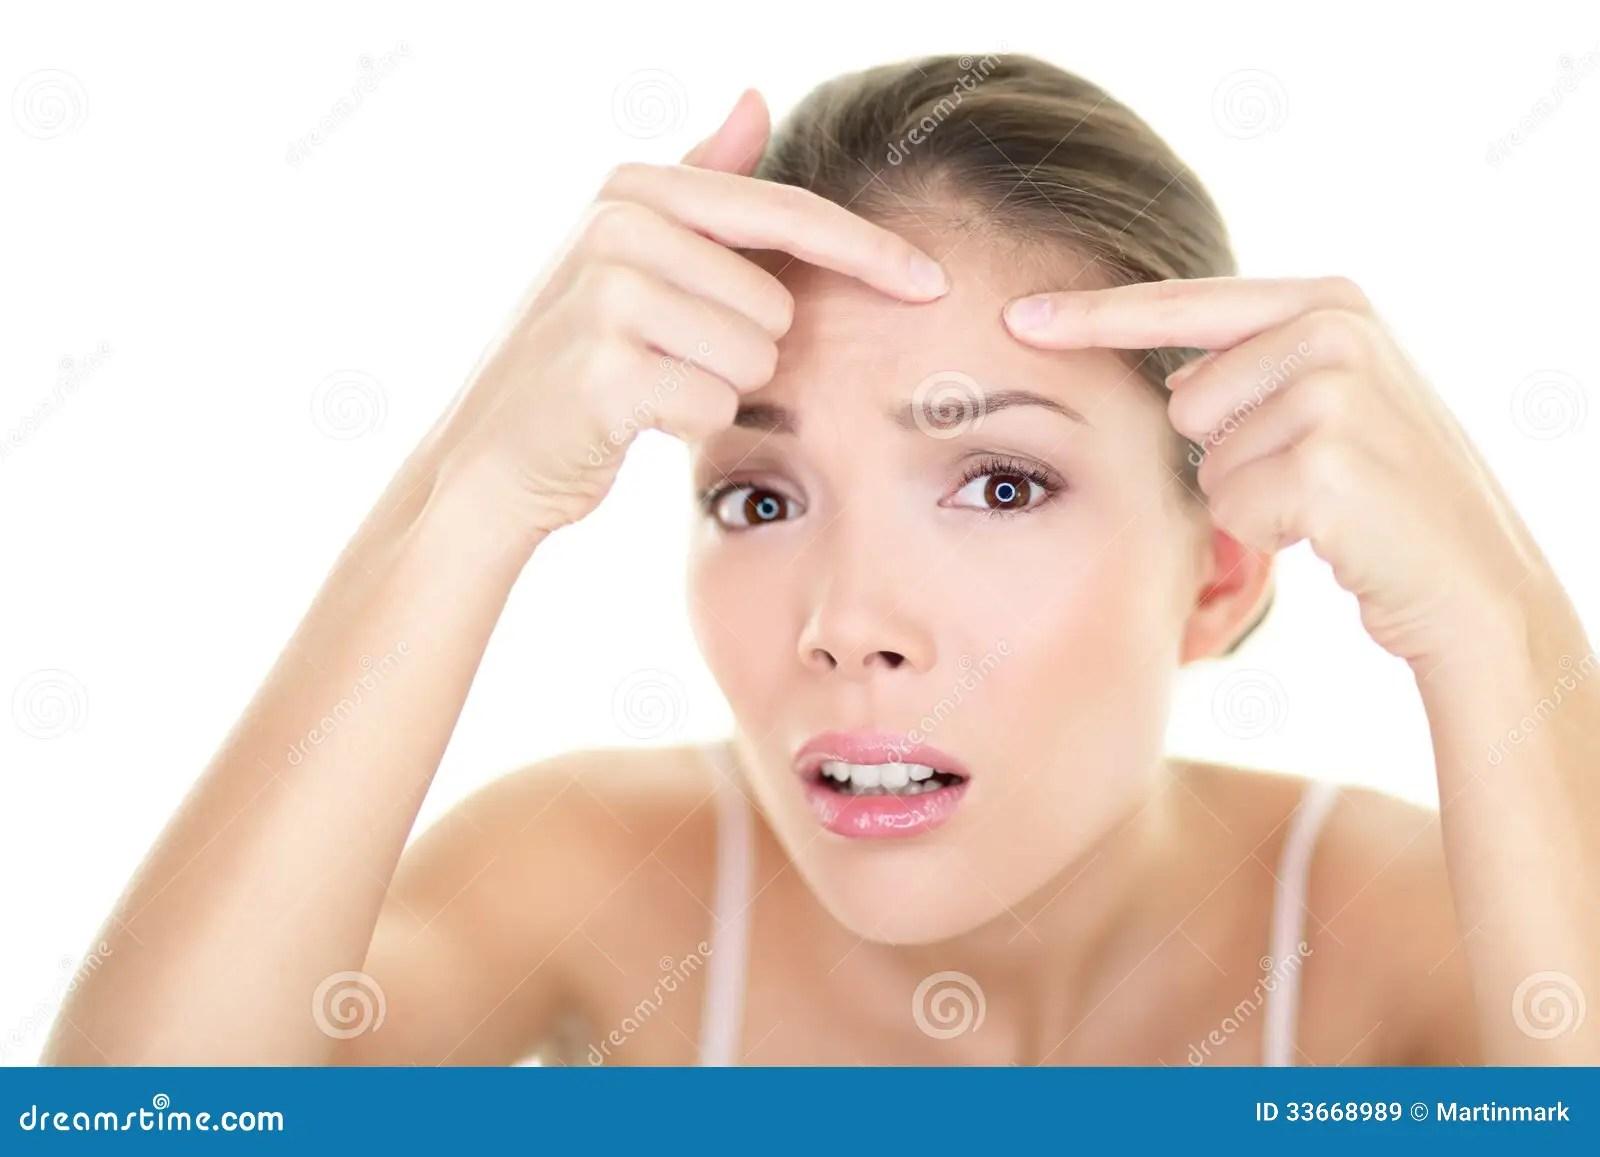 diagram for pimples on face 2006 subaru impreza wrx wiring acne spot pimple skin care girl problem royalty